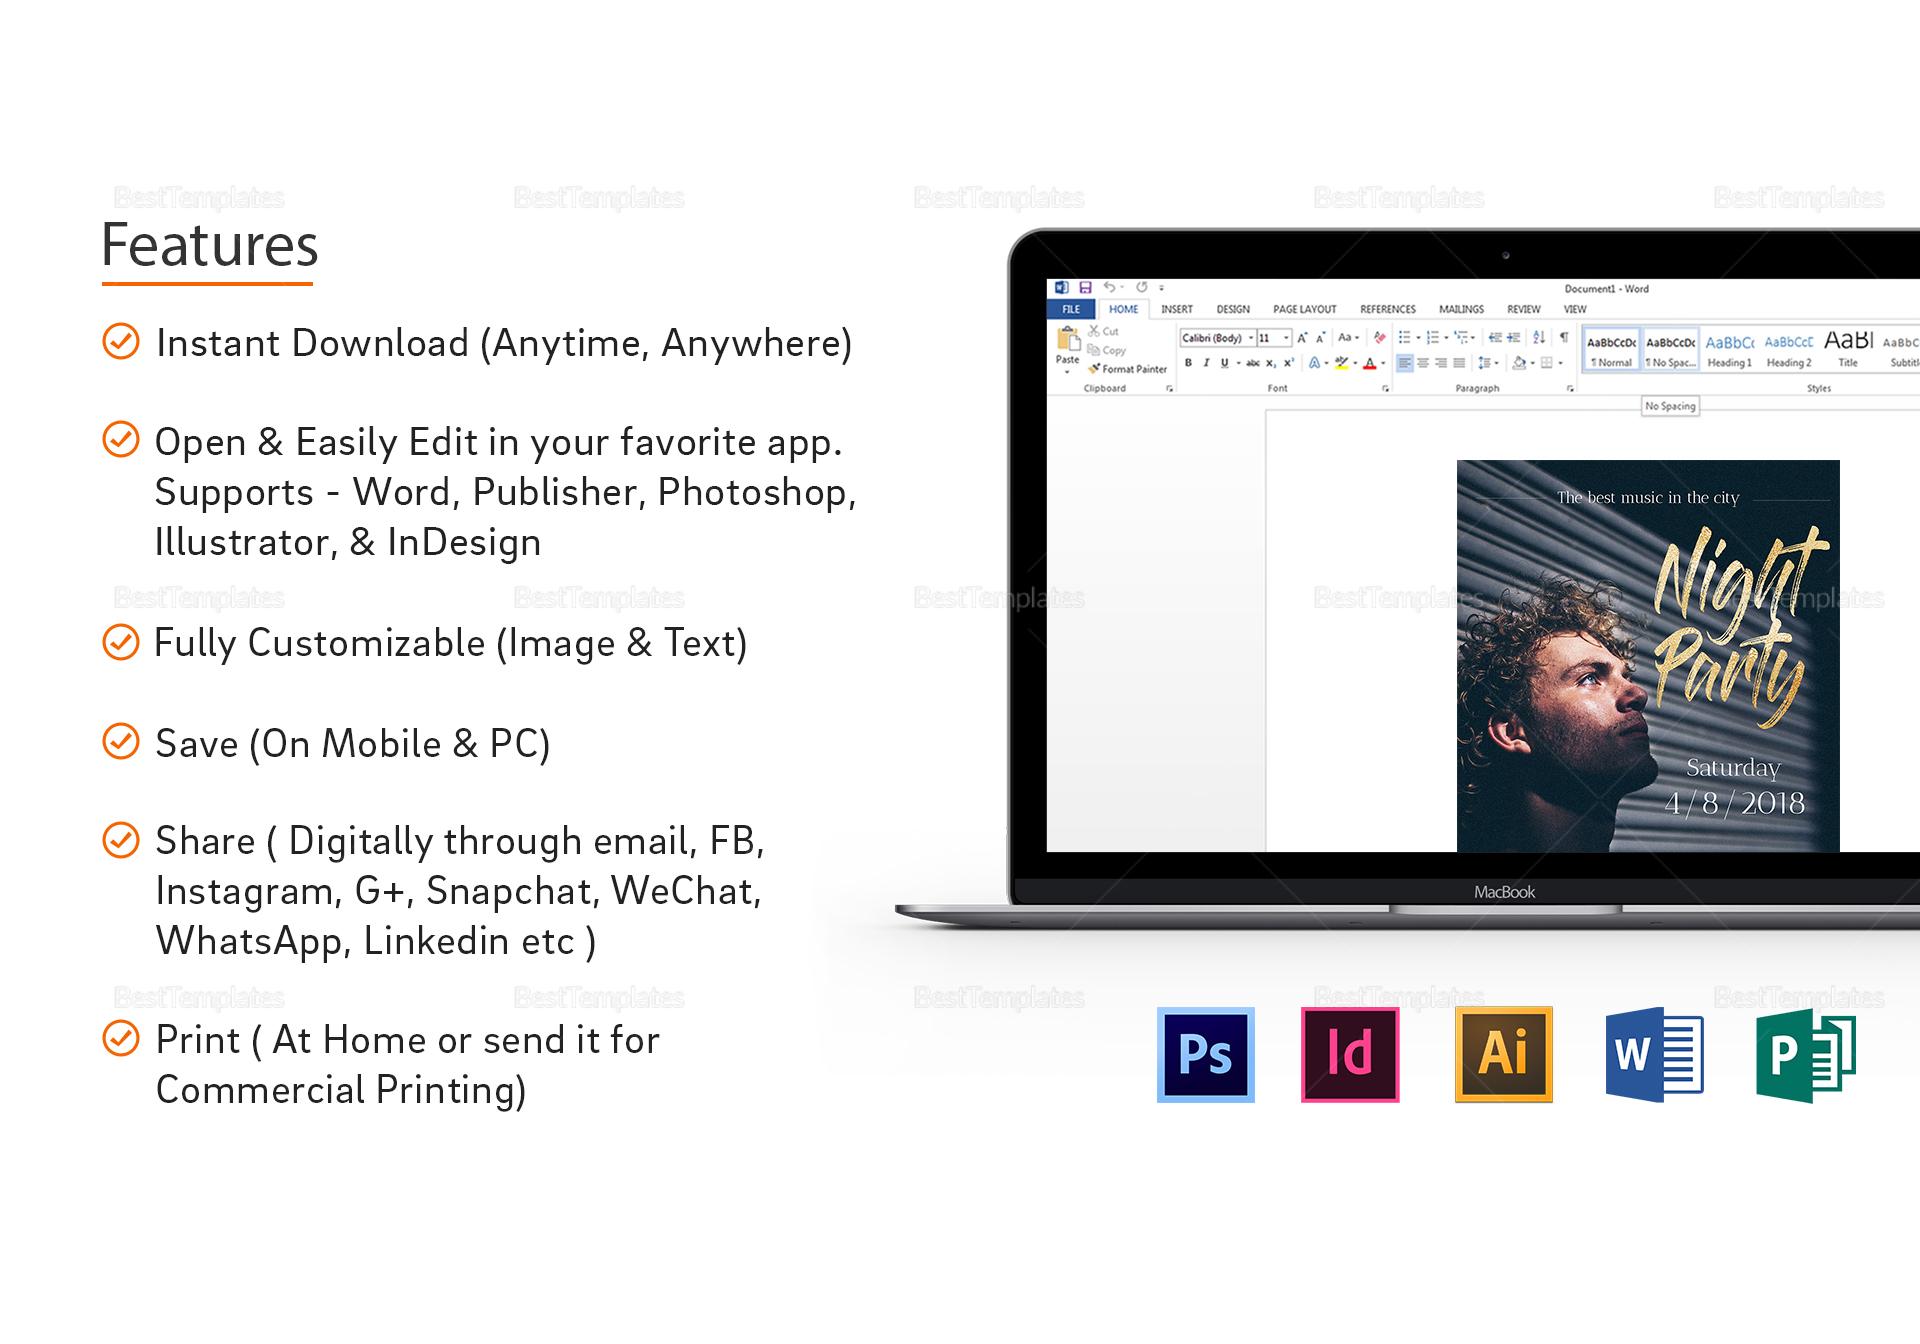 Dj Geek Flyer Template to Print